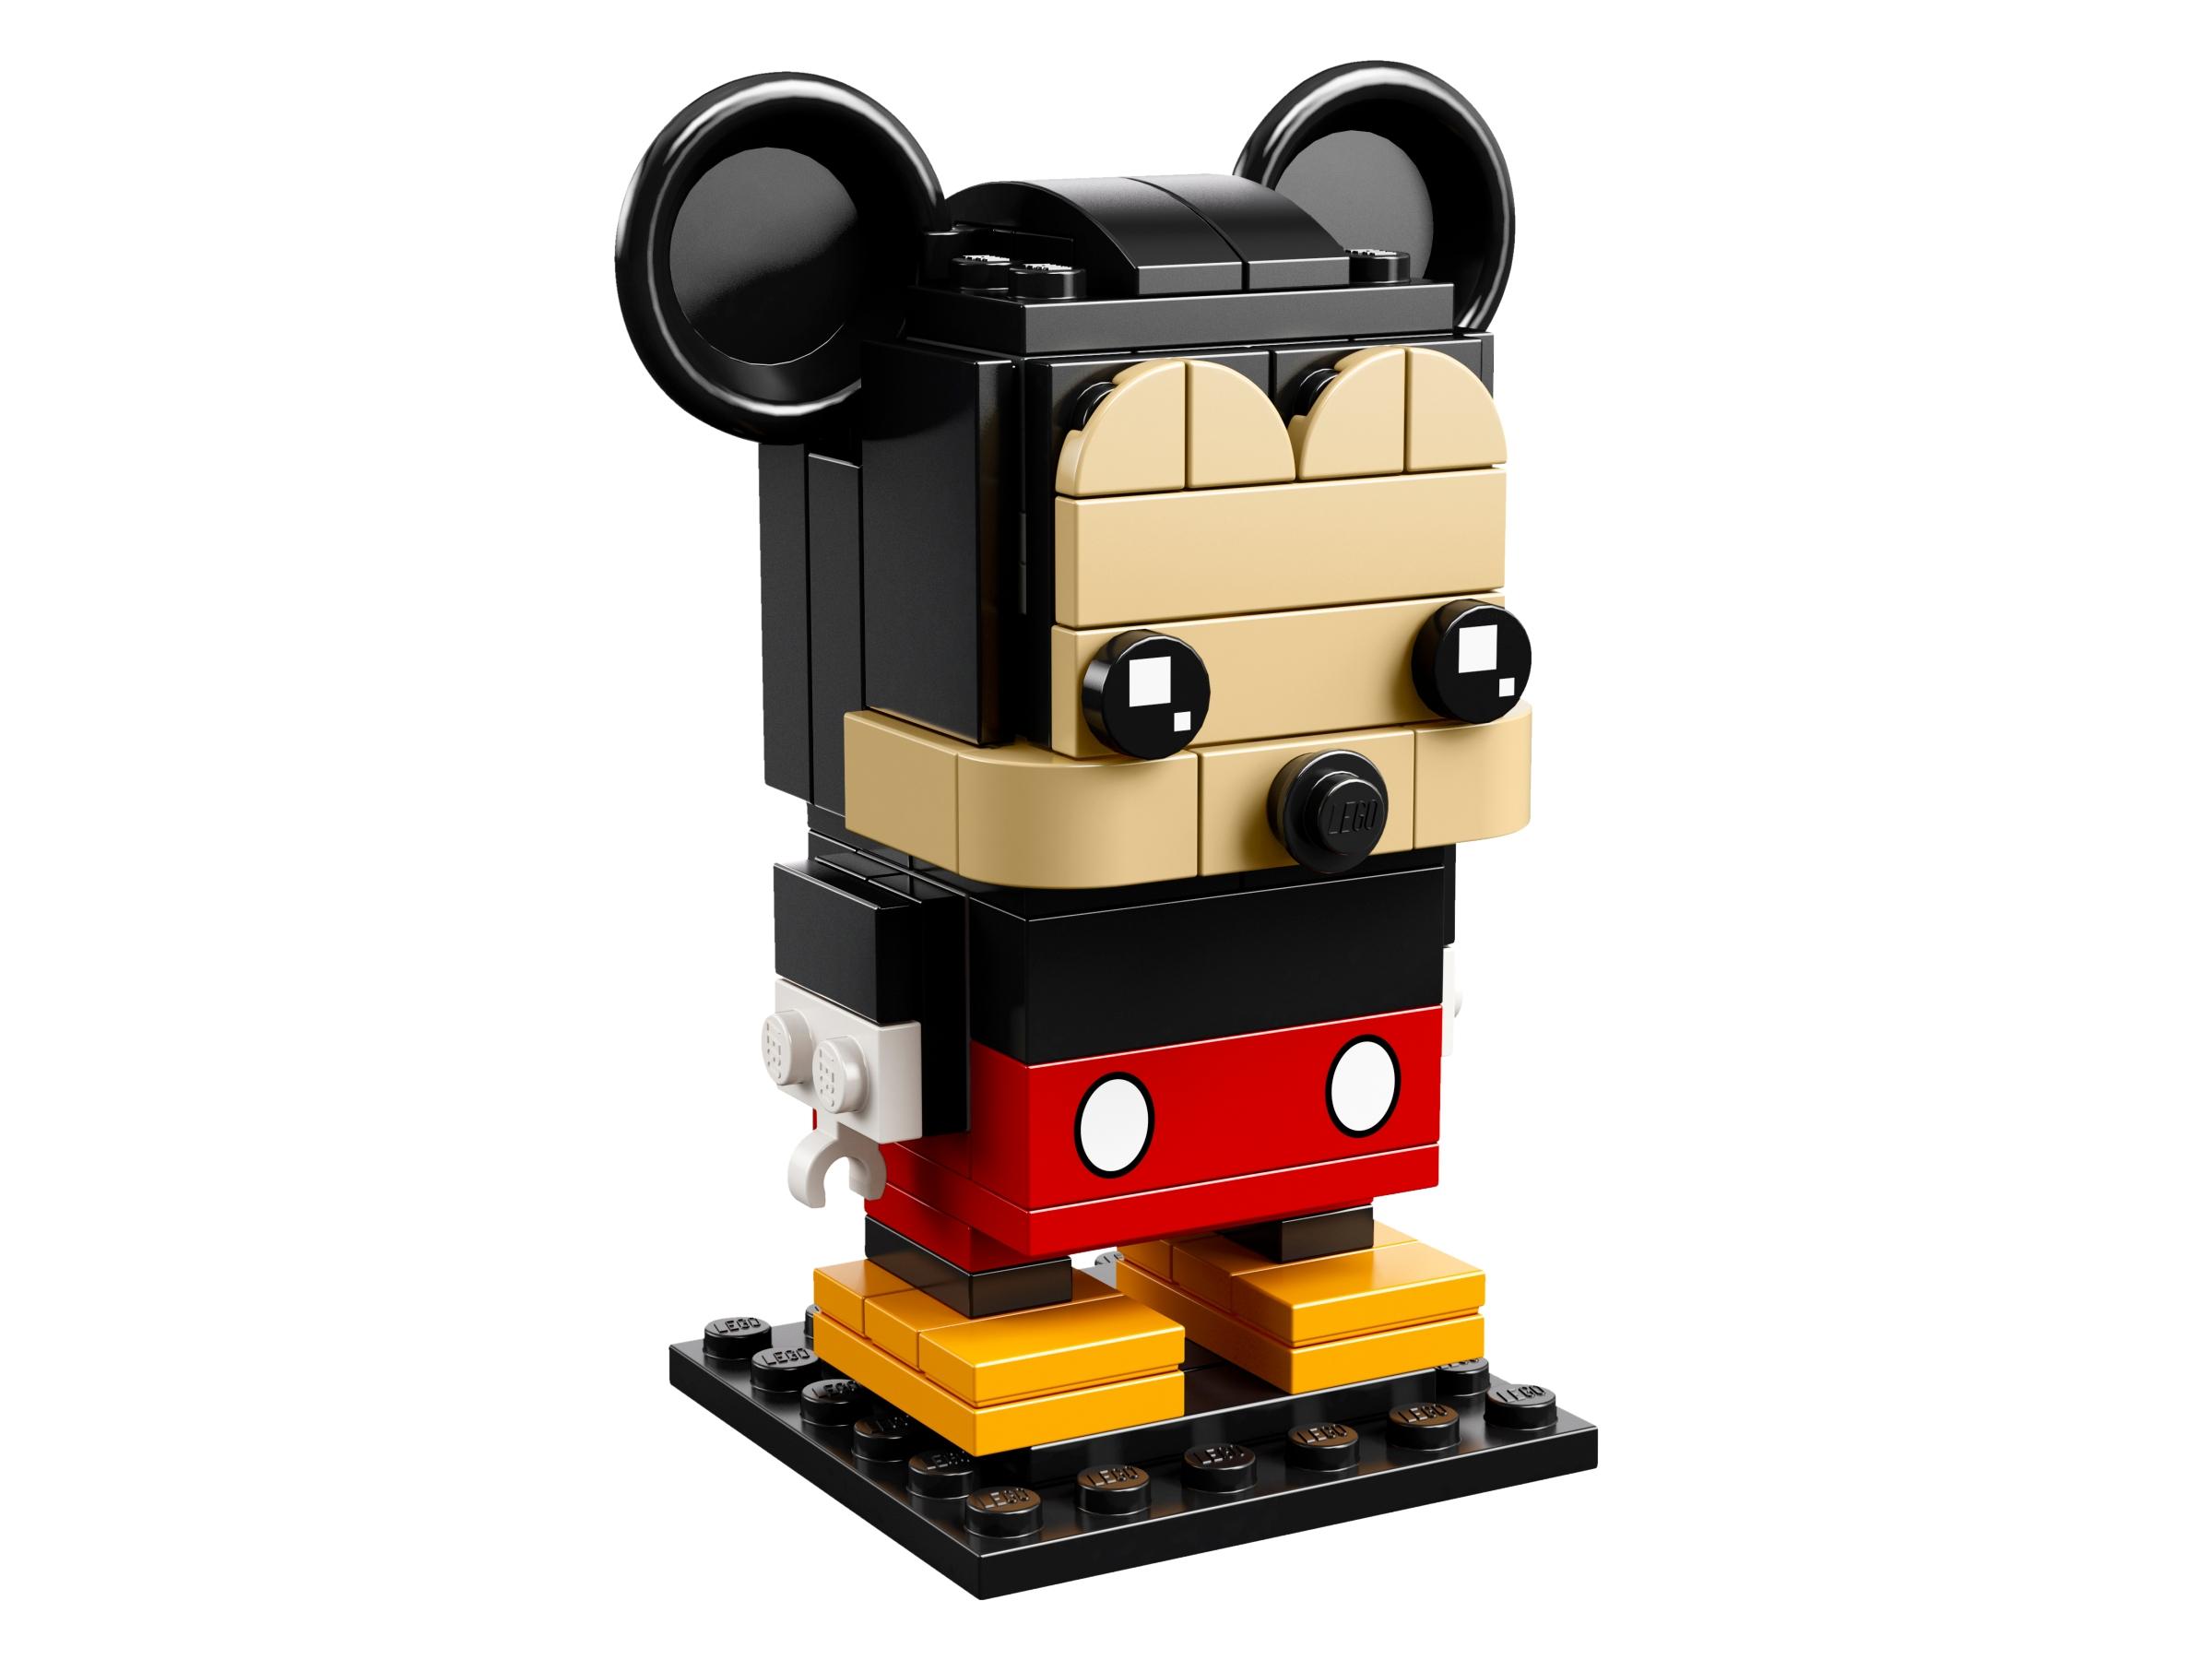 Lego brickheadz Disney Mickey Mouse 41624